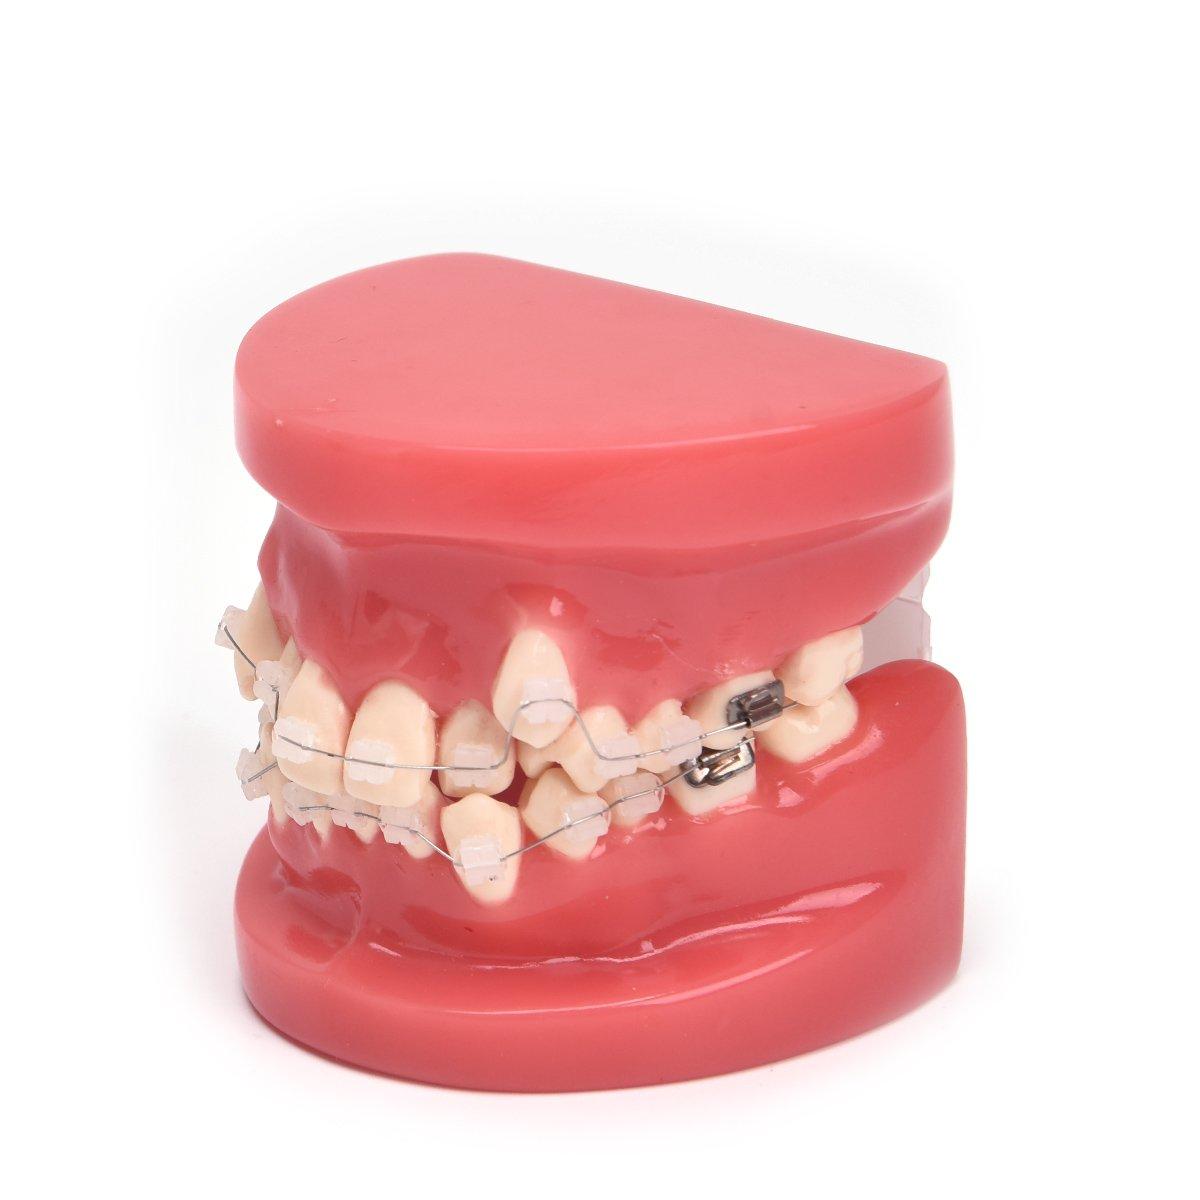 Annhua Demonstration Orthodontic Model Teeth Teach Study Tools with Transparent Ceramic Bracket